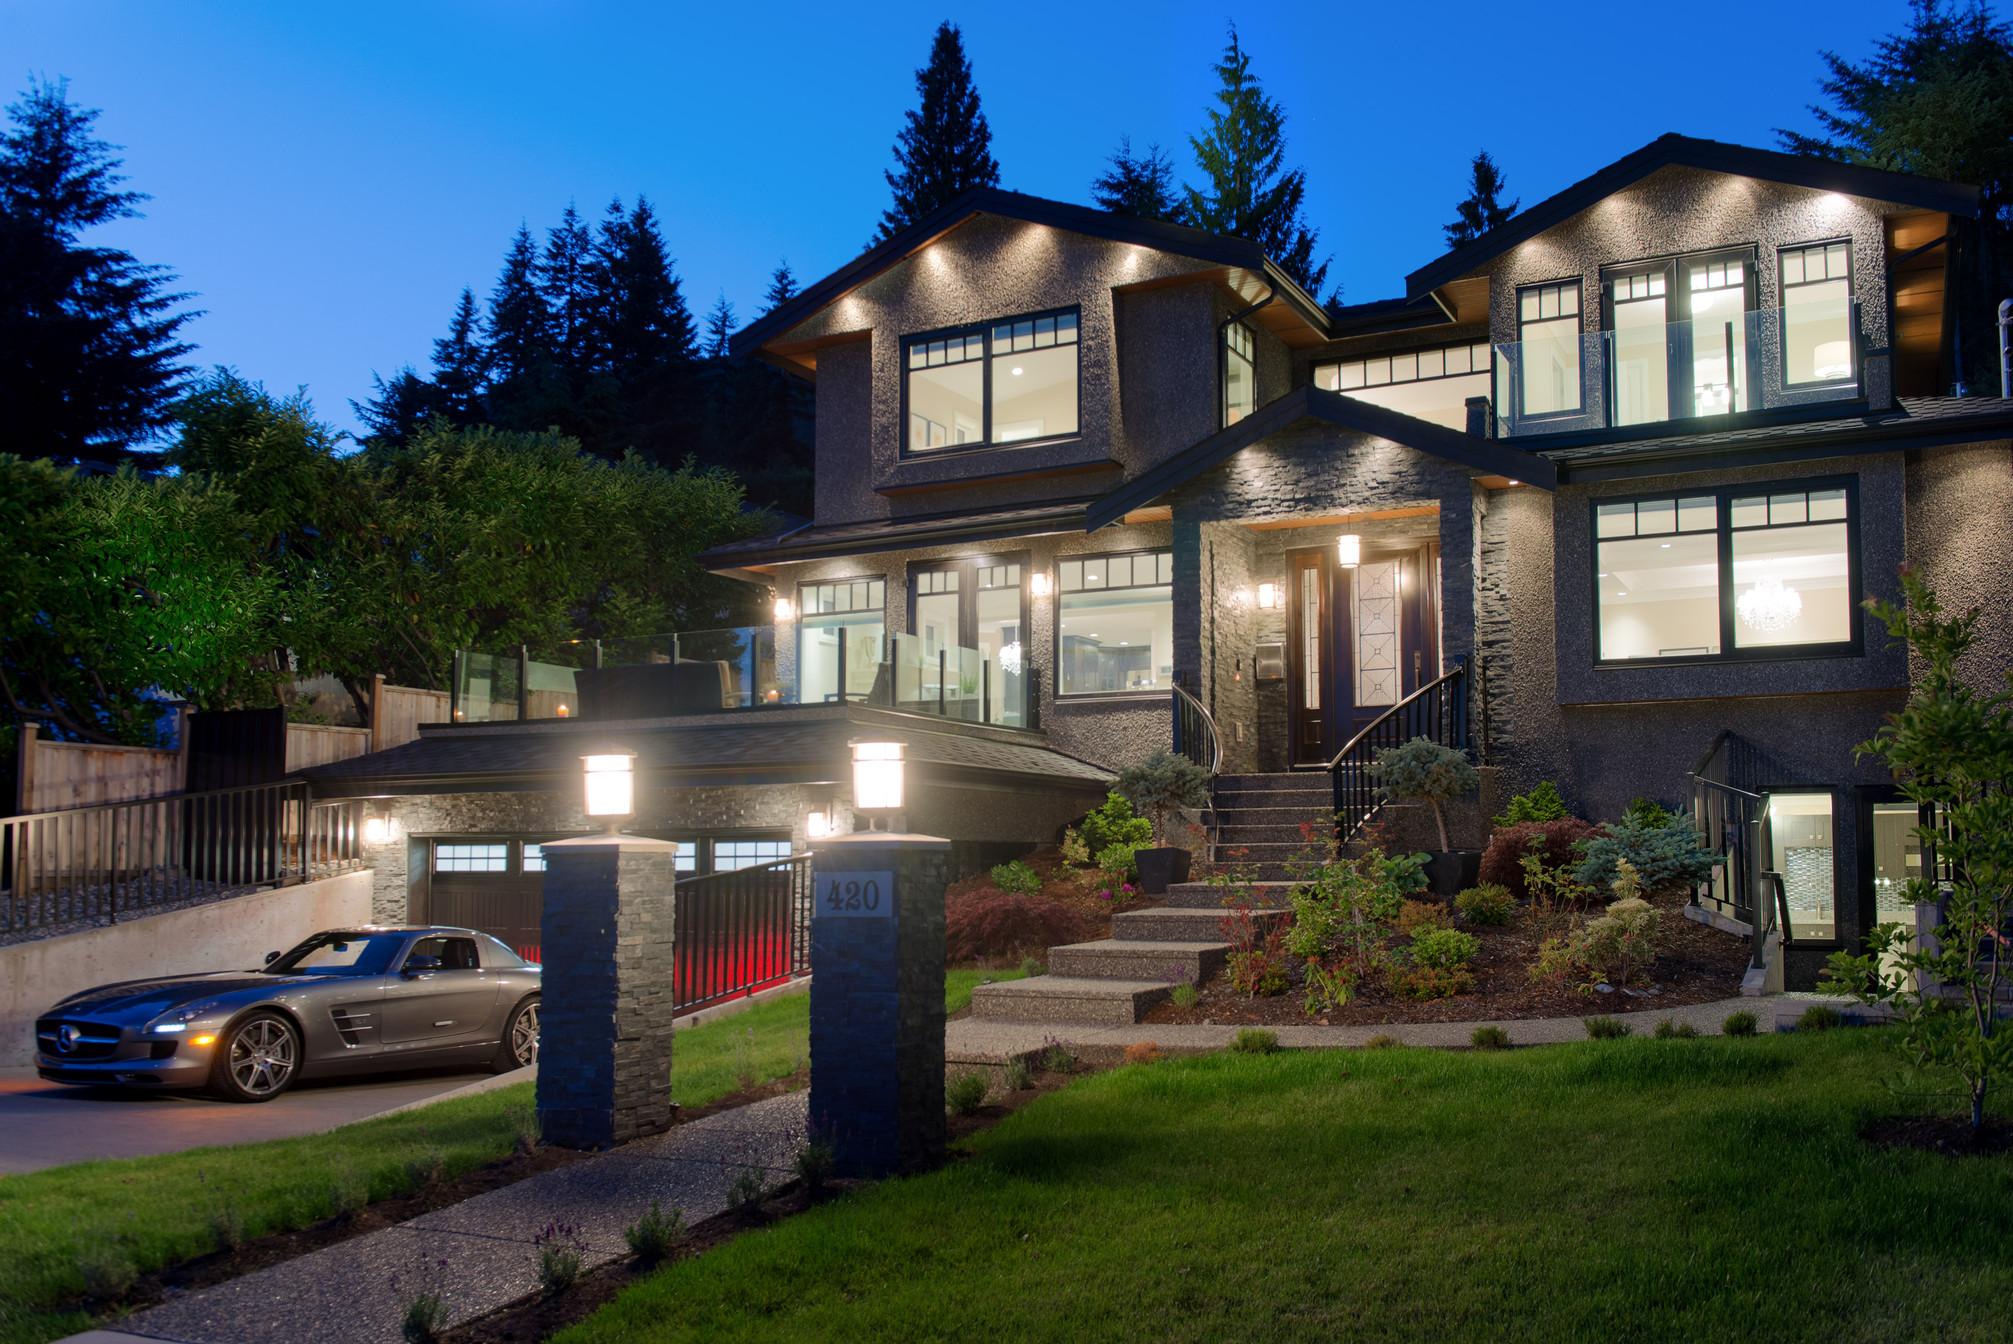 420 Crestwood Avenue, Upper Delbrook, North Vancouver